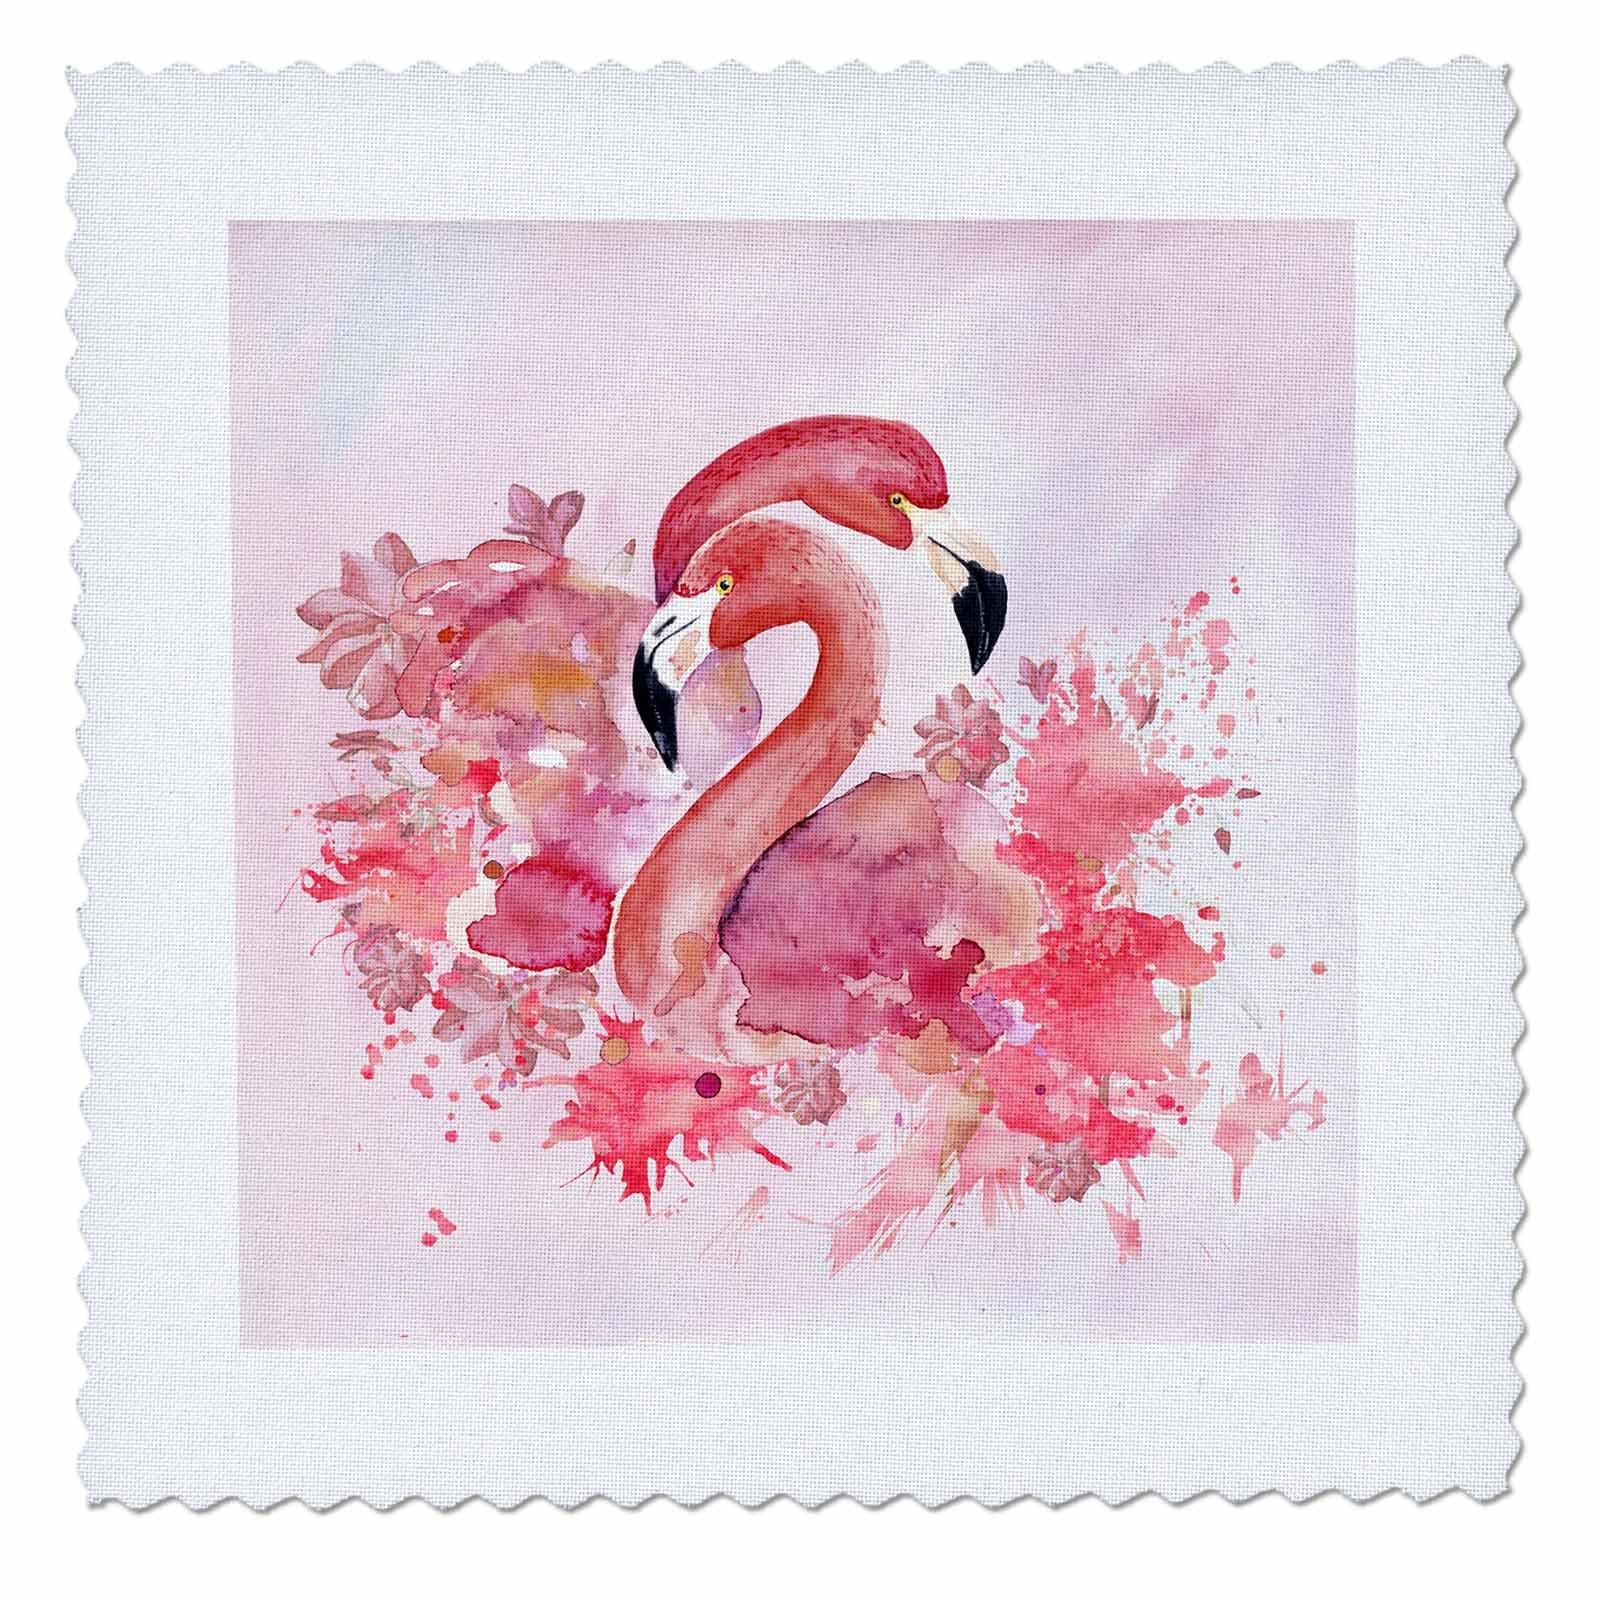 3dRose Uta Naumann Watercolor Illustration Animal - Two Beautiful Pink Flamingos Watercolor Anima Illustration - 22x22 inch quilt square (qs_266992_9)